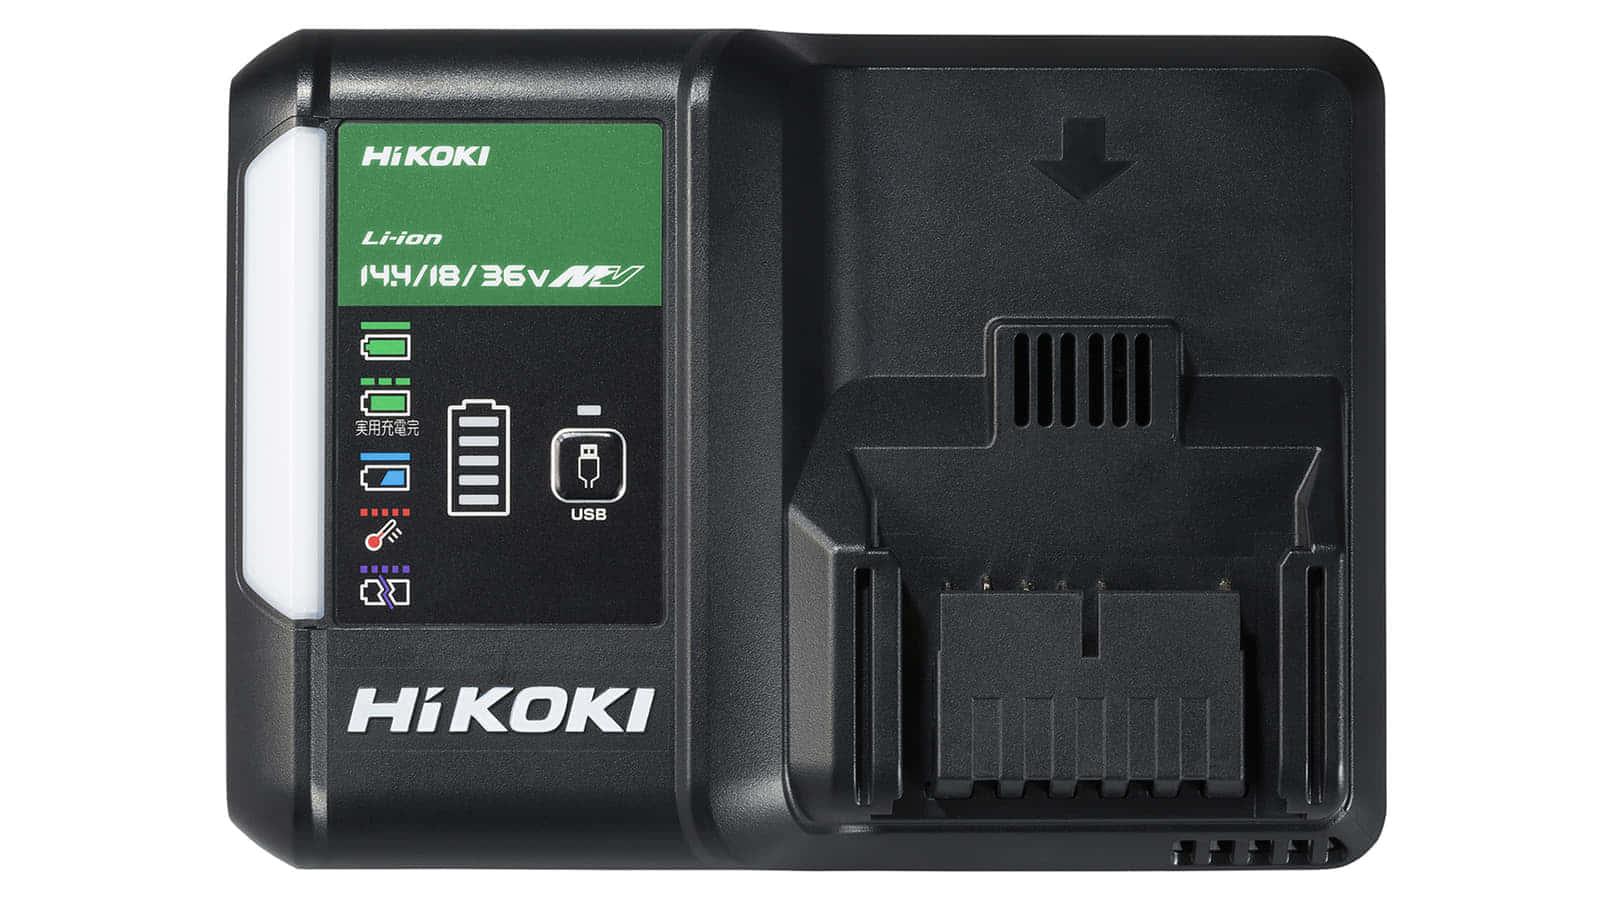 HiKOKI UC18YDL2 充電時-7dbの低騒音化を実現した新型充電器